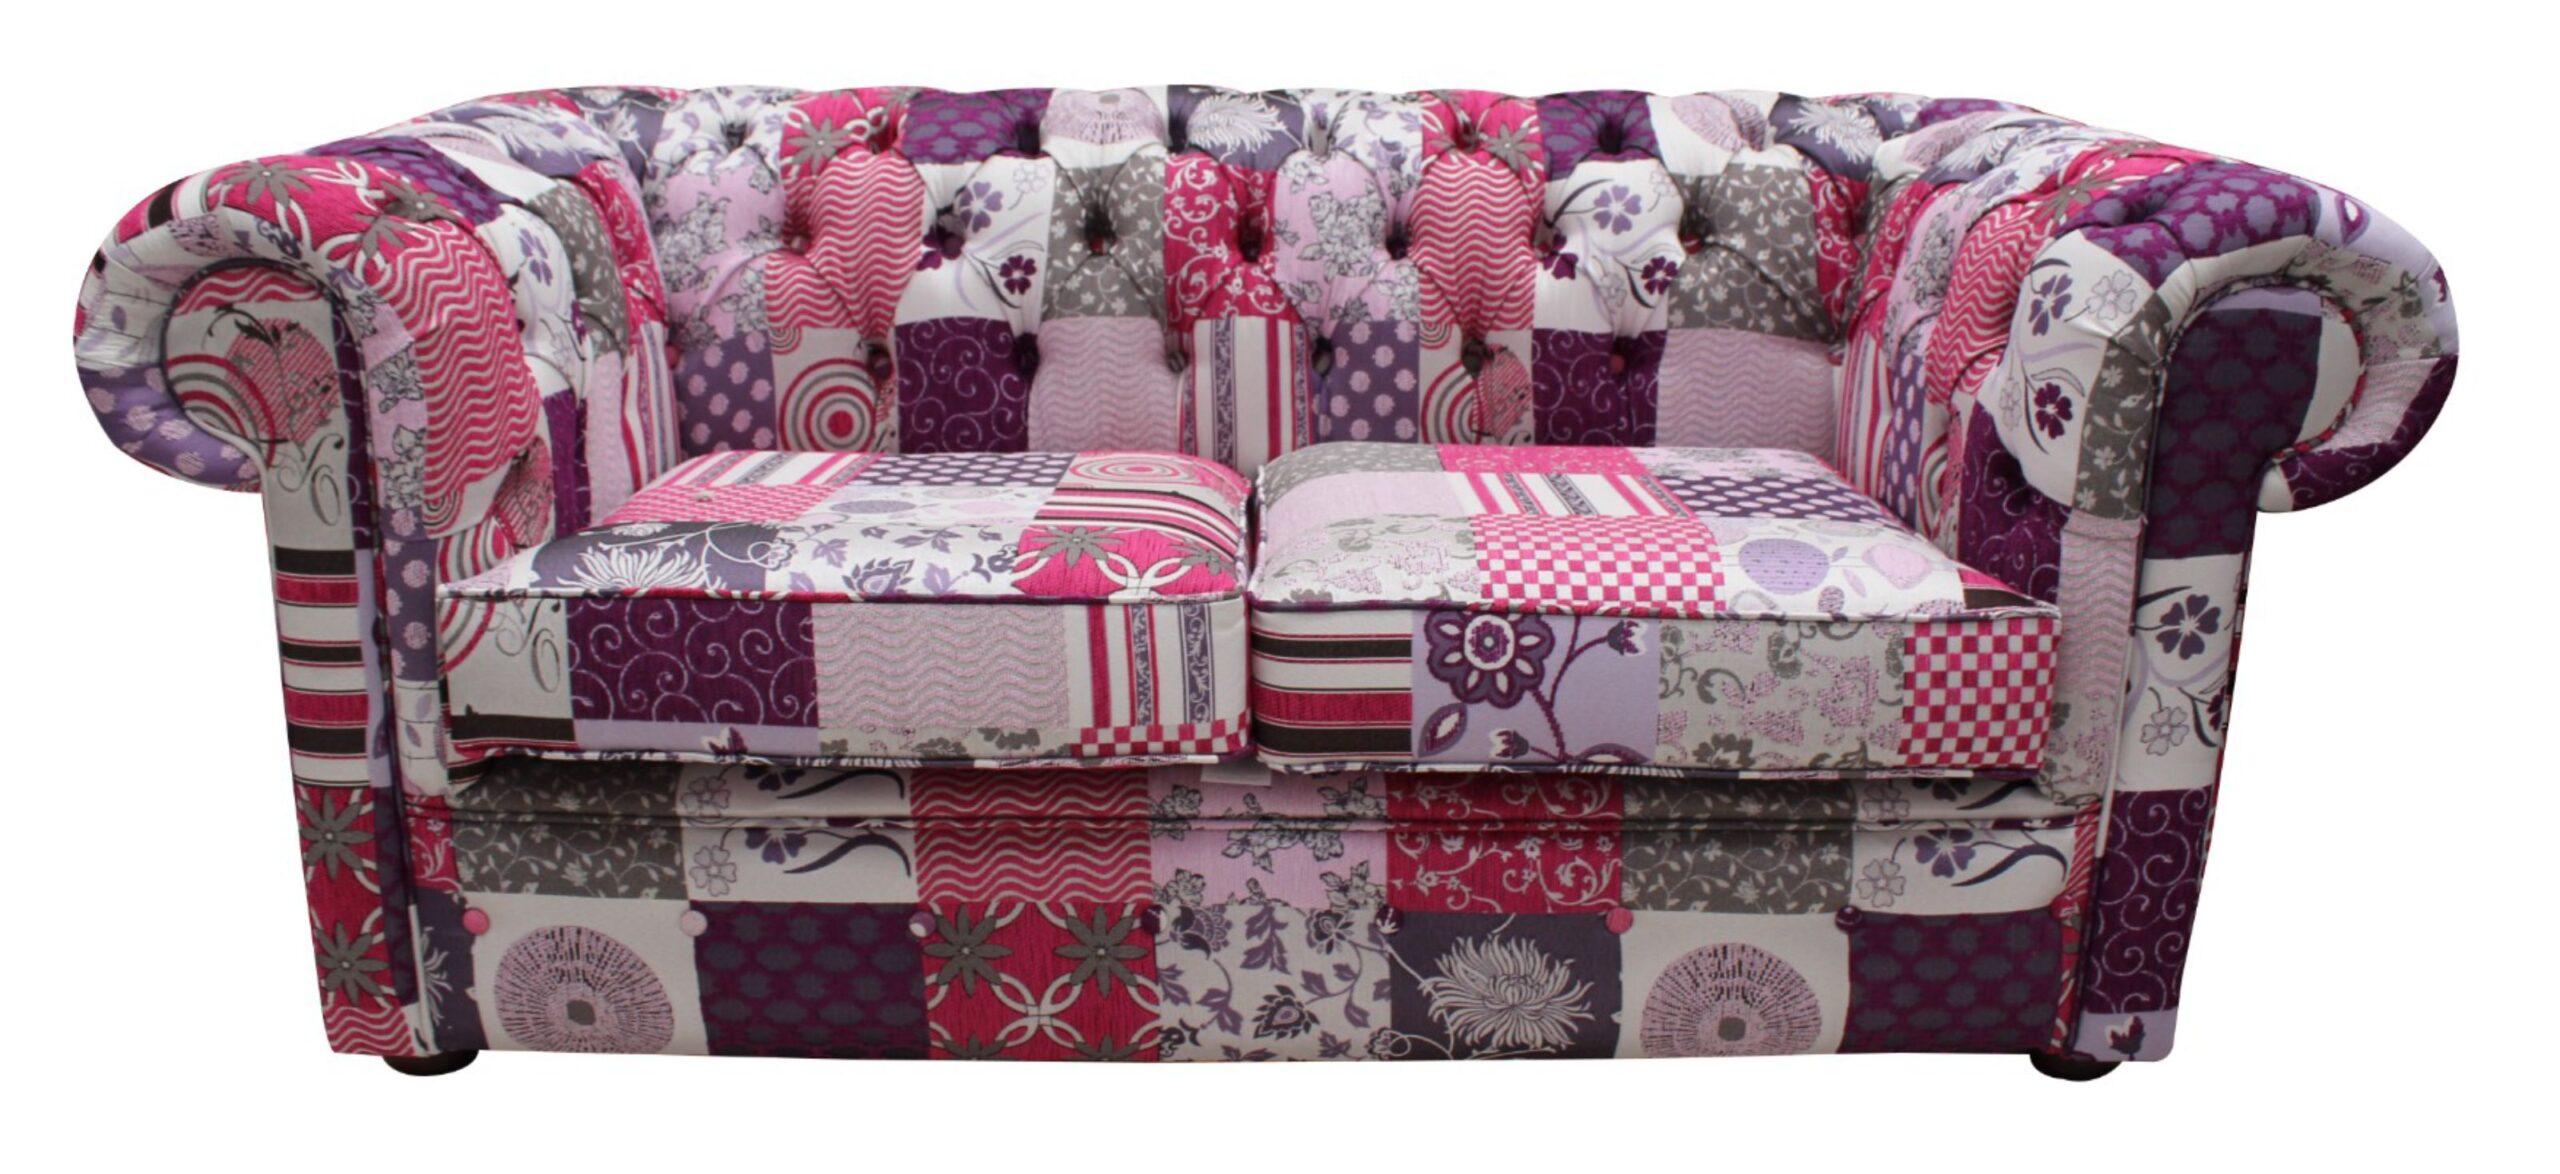 Full Size of Dfs Patchwork Sofa Ebay Chesterfield Bed Uk Grey Doll Amazon Fiesta 2 Seater Settee Fabric Offer 3er Grau Schlafsofa Liegefläche 160x200 Home Affaire Sofa Sofa Patchwork